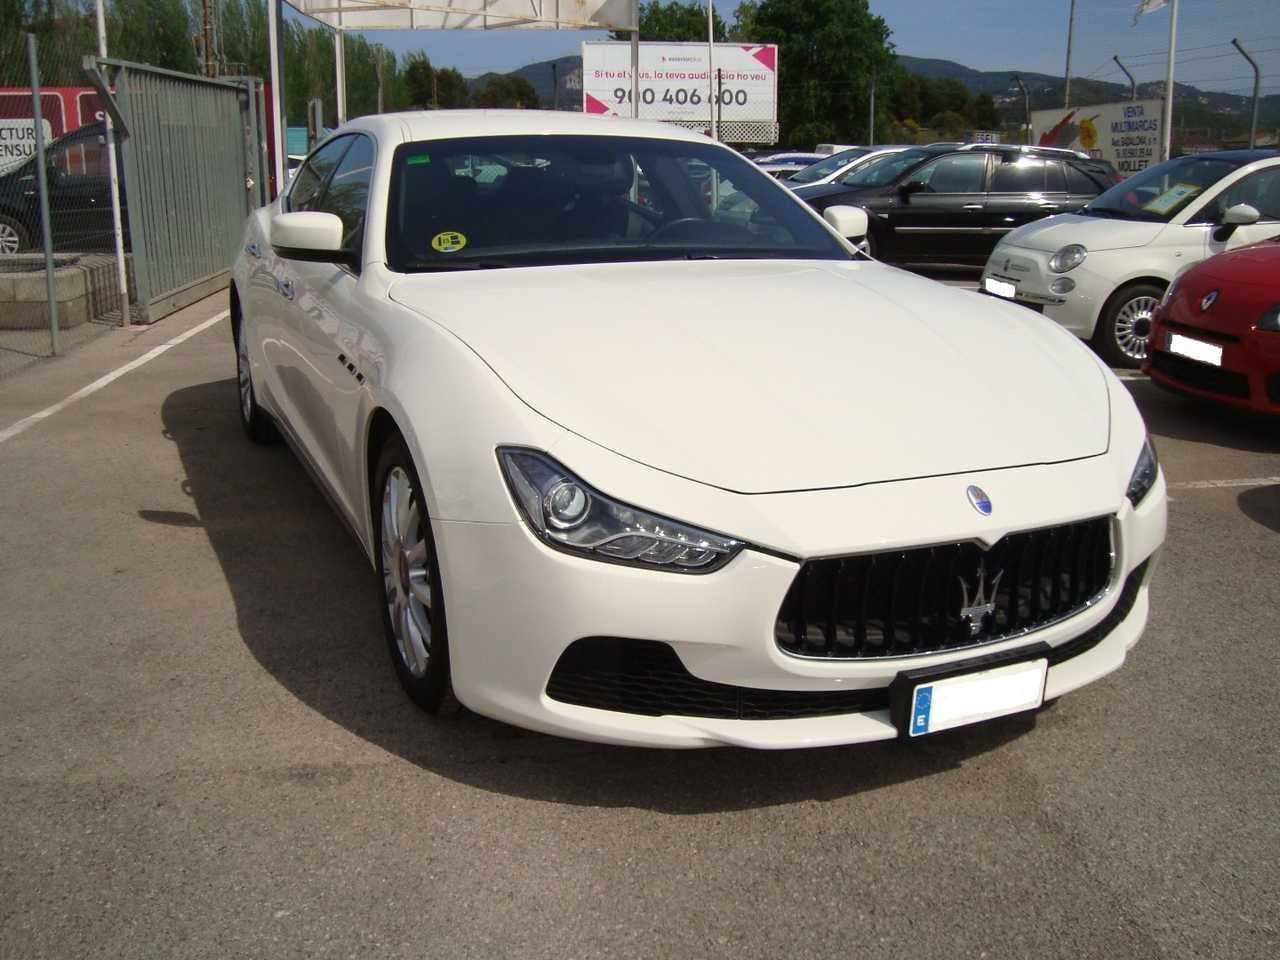 Maserati Ghibli 3.0  275 CV V6 DIESEL  AUTOMATICO   - Foto 1